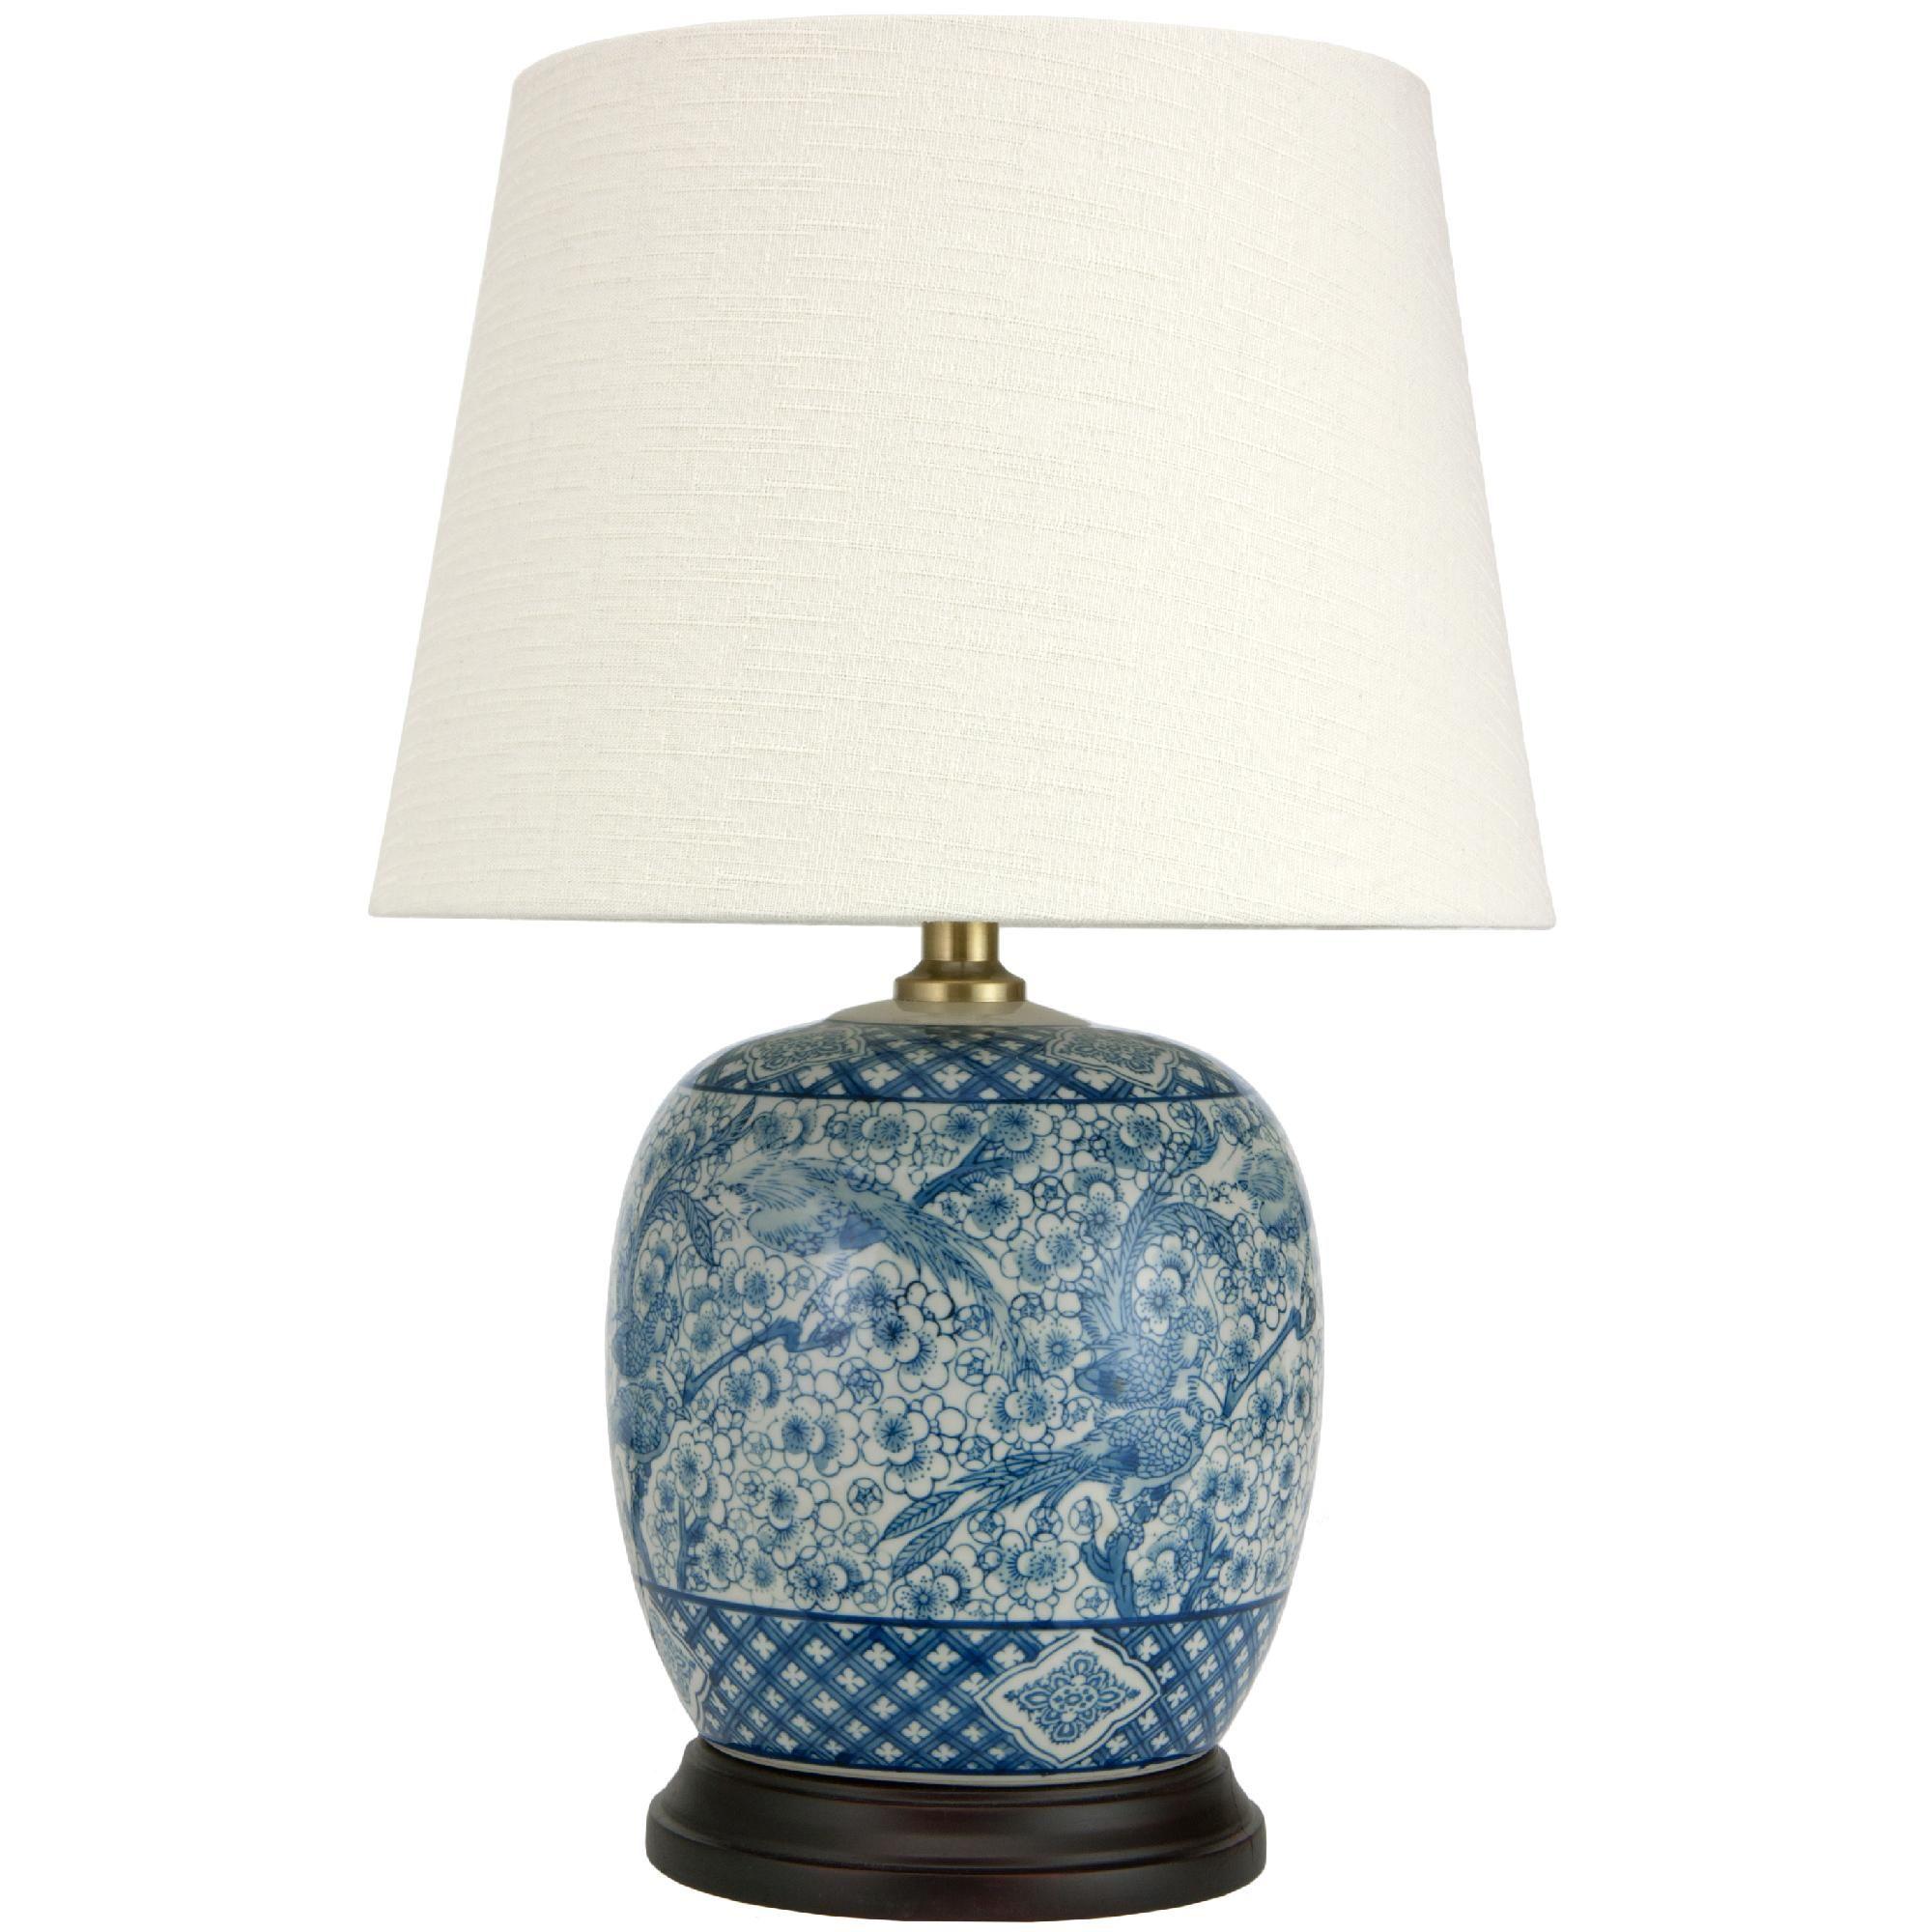 Oriental furniture 20 classic blue white porcelain jar lamp oriental furniture 20 classic blue white porcelain jar lamp aloadofball Image collections